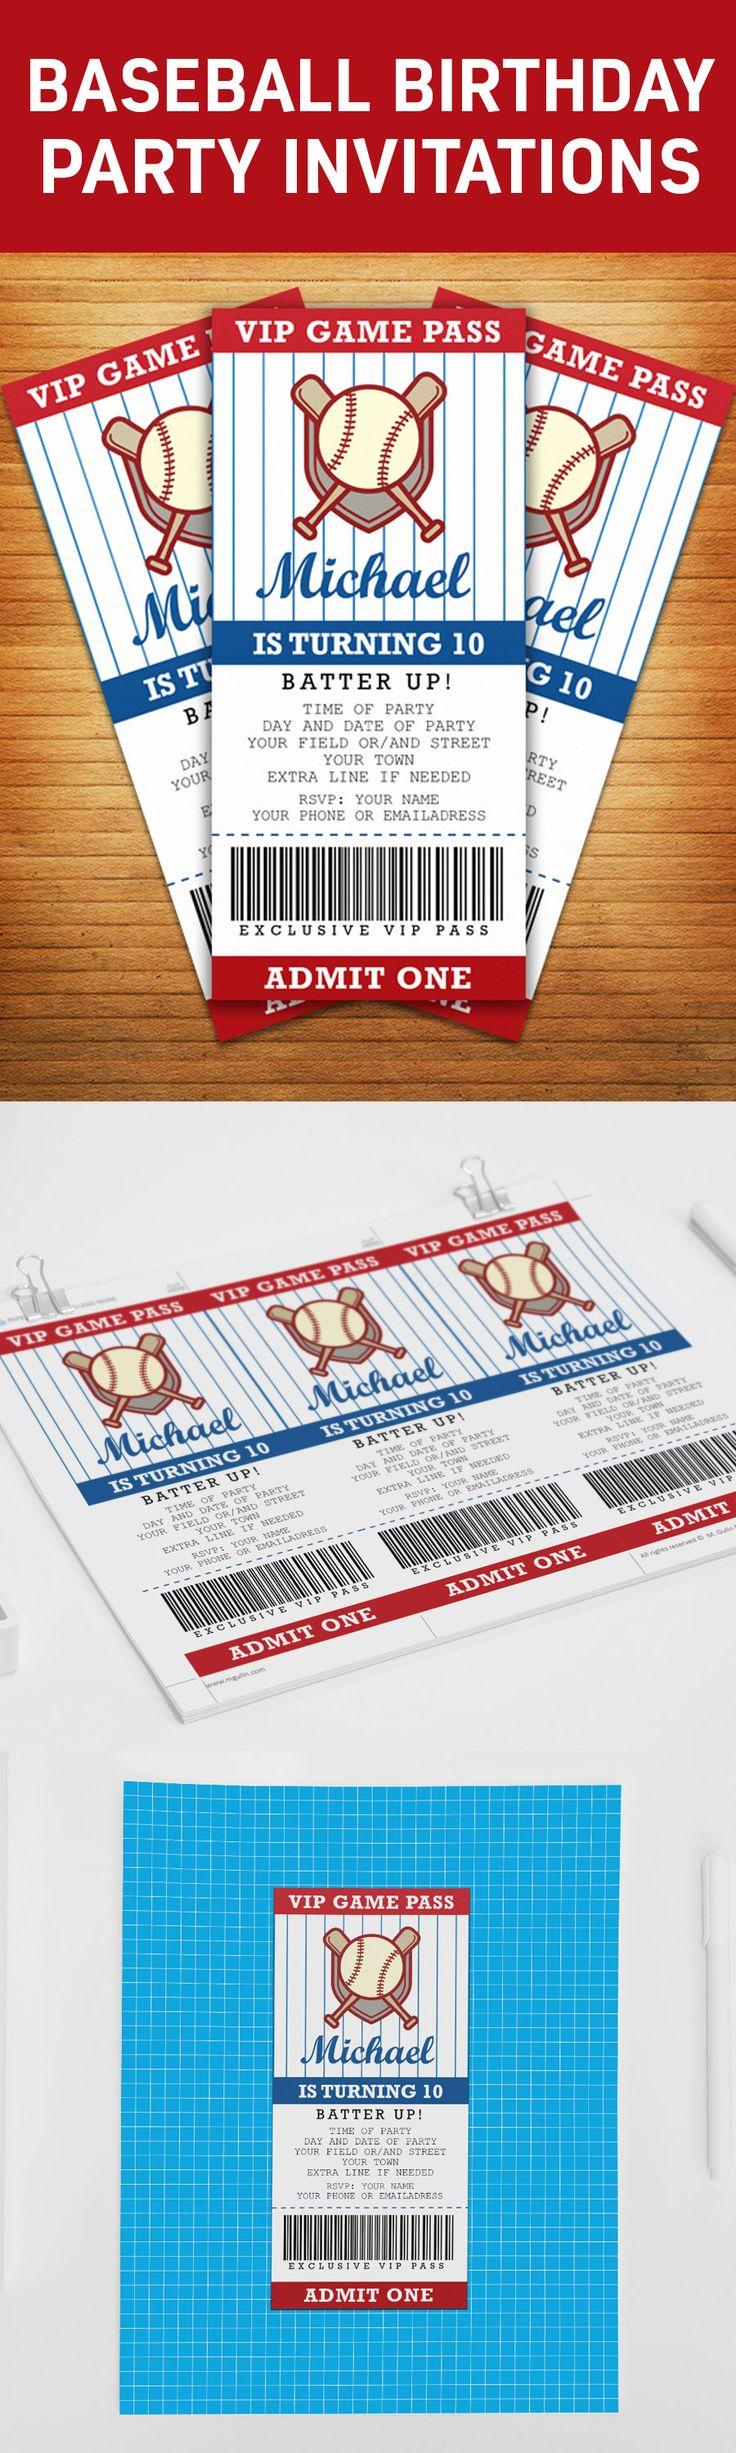 Create a cool baseball / softball themed birthday party invitation!